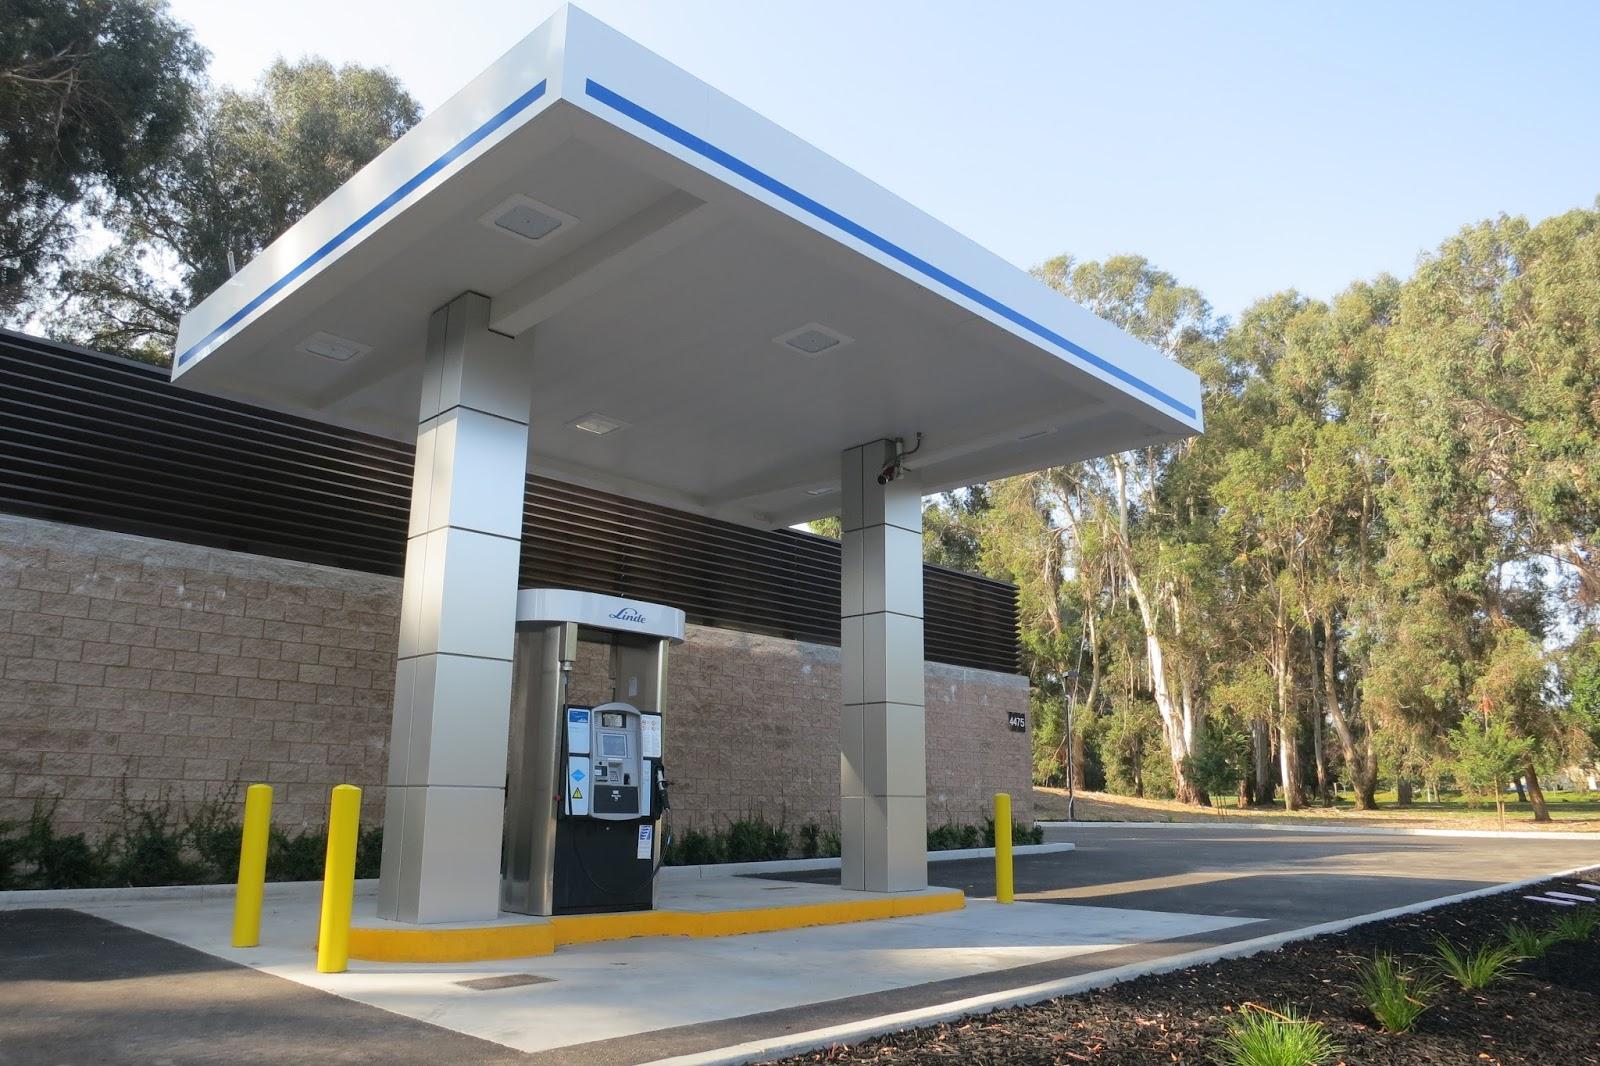 Photos courtesy of the California Fuel Cell Partnership